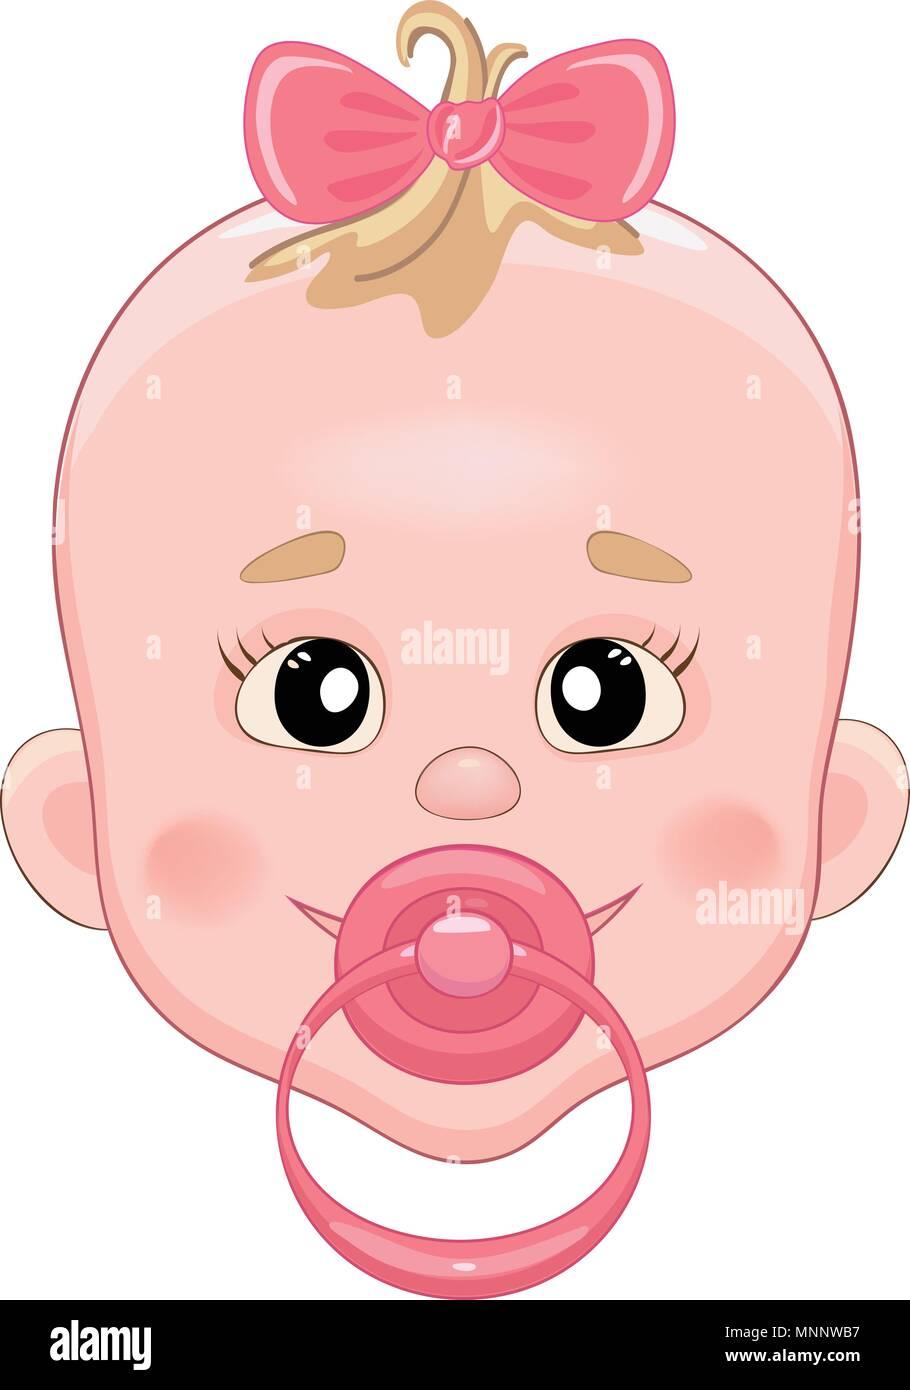 Baby Schnuller Vektor Clipart Bild -vc019912-CoolCLIPS.com